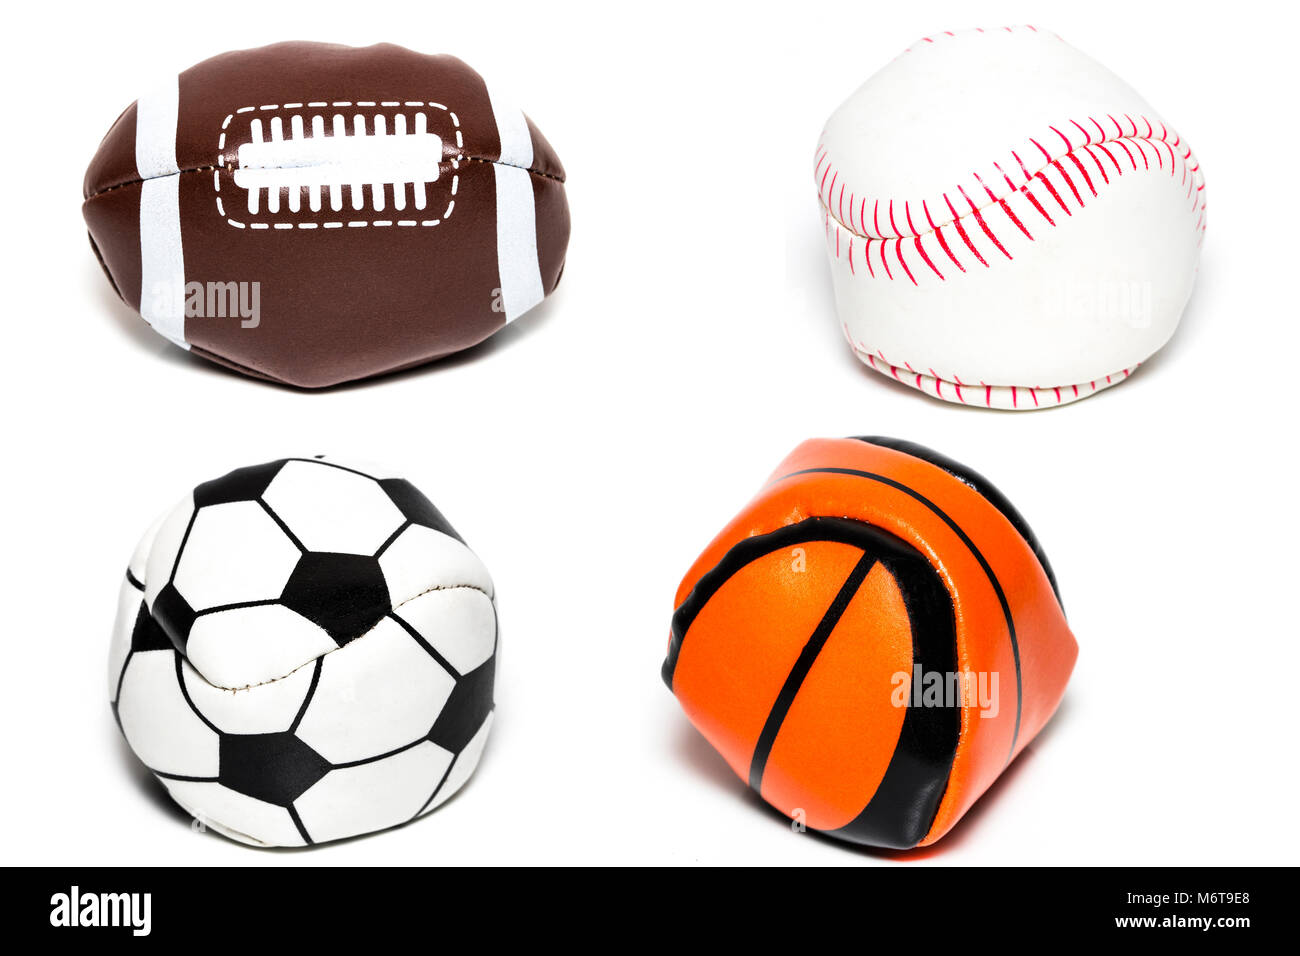 A Basketball And A Baseball Ball Imágenes De Stock   A Basketball ... eb339e48c3fbd